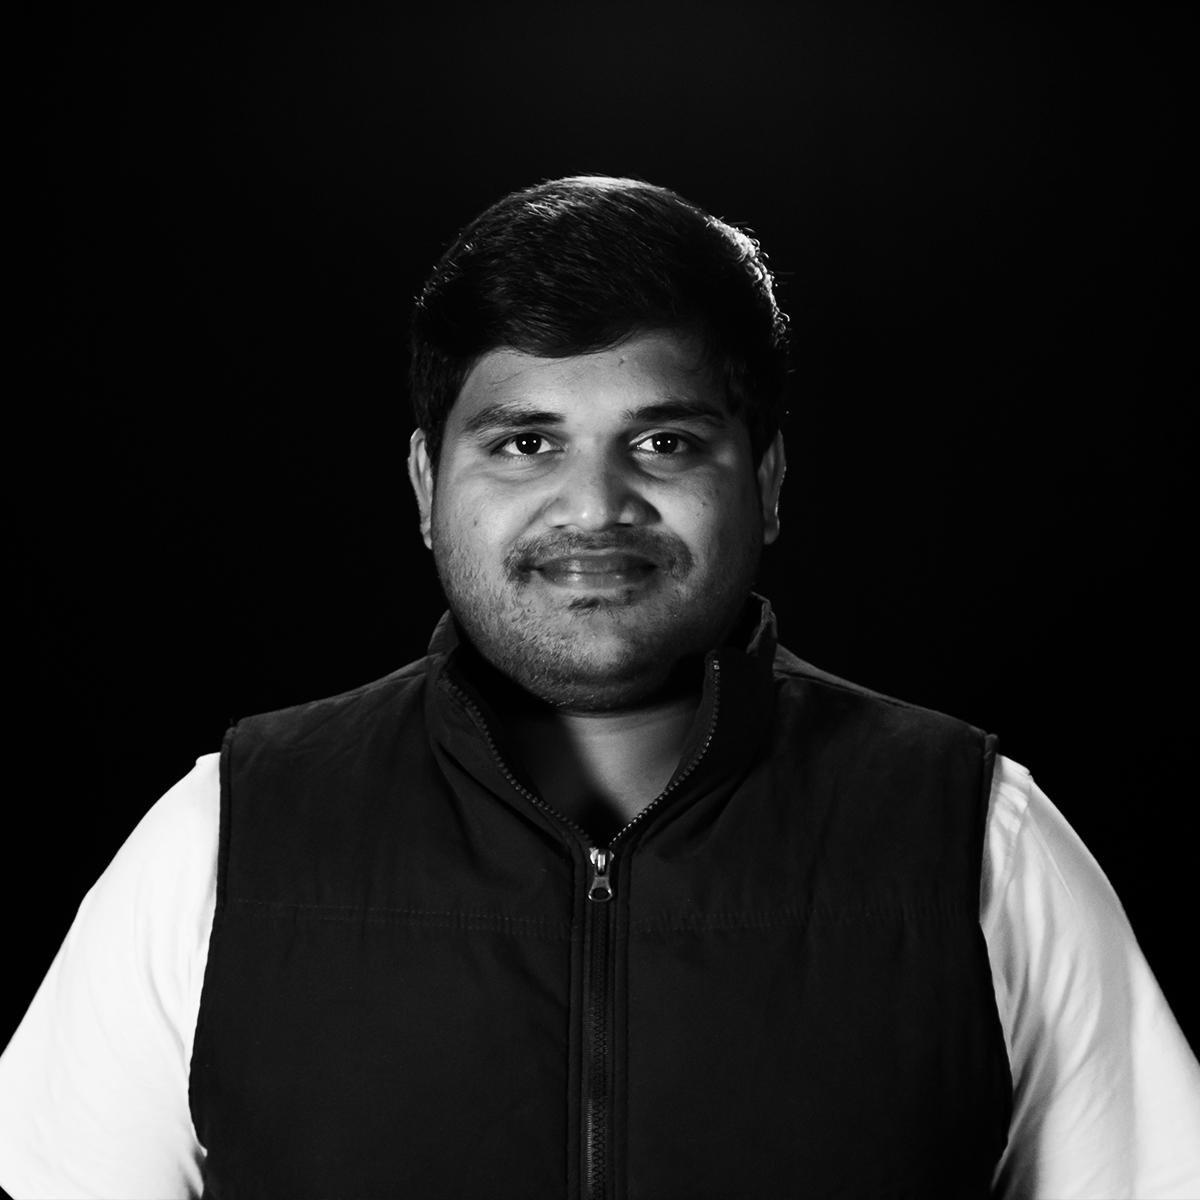 Avinash Endurthi